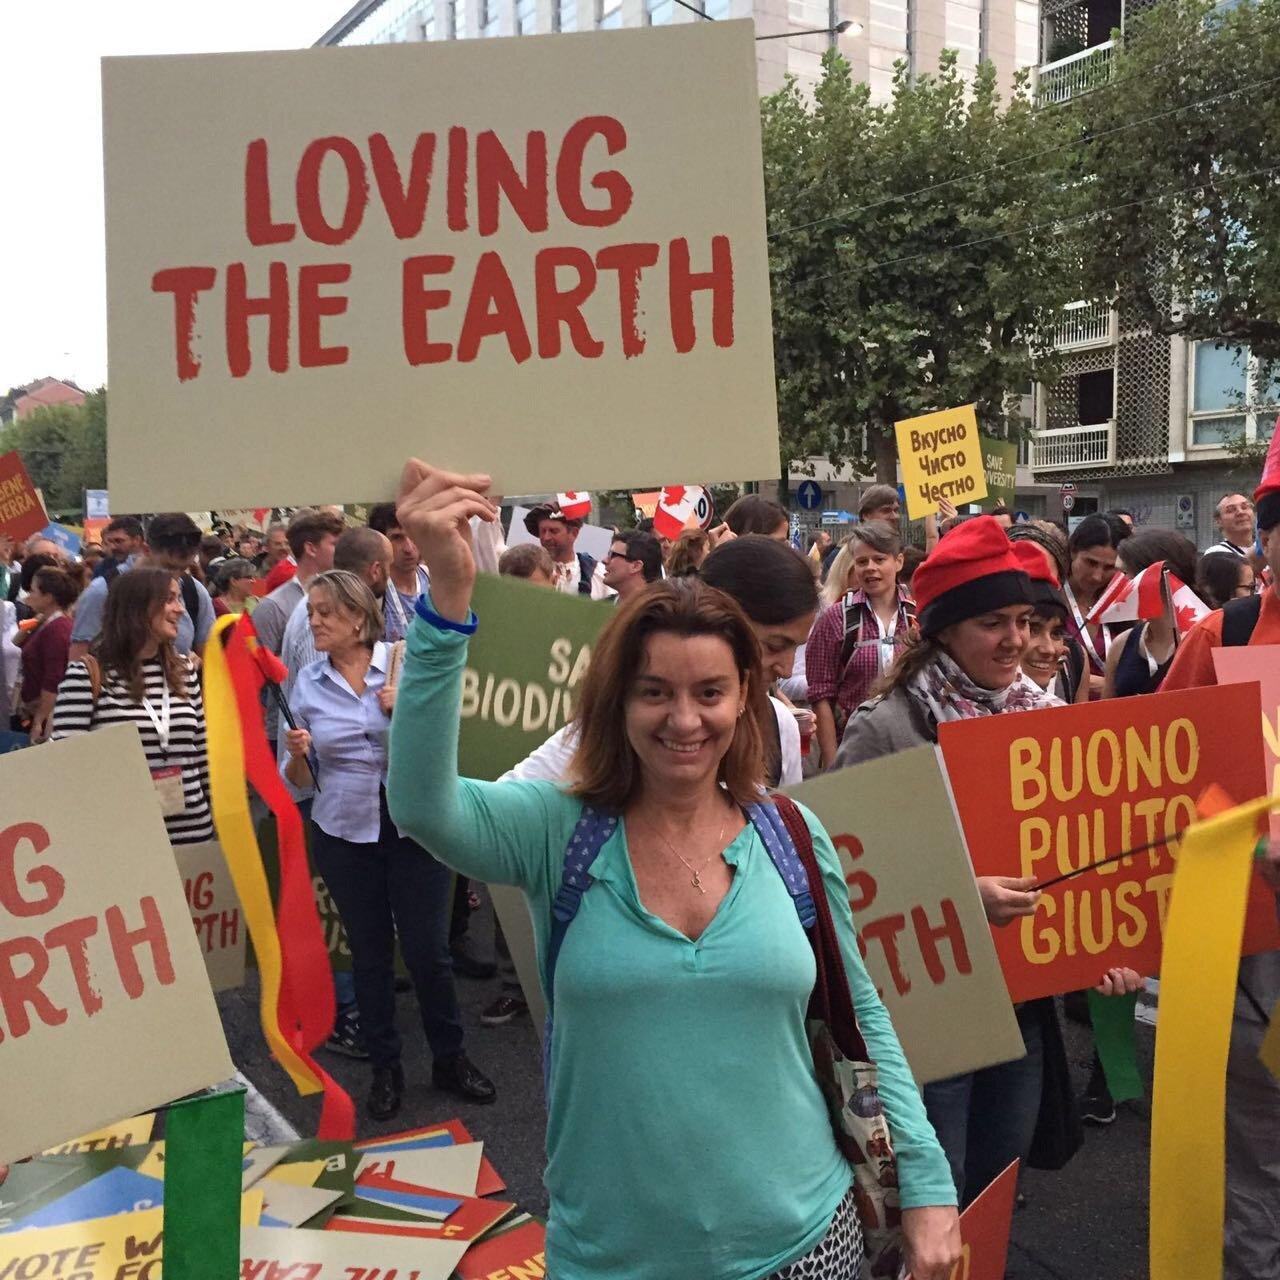 Andrea Russo na passeata do Slow Food - Terra Madre2016 - Turim.jpg